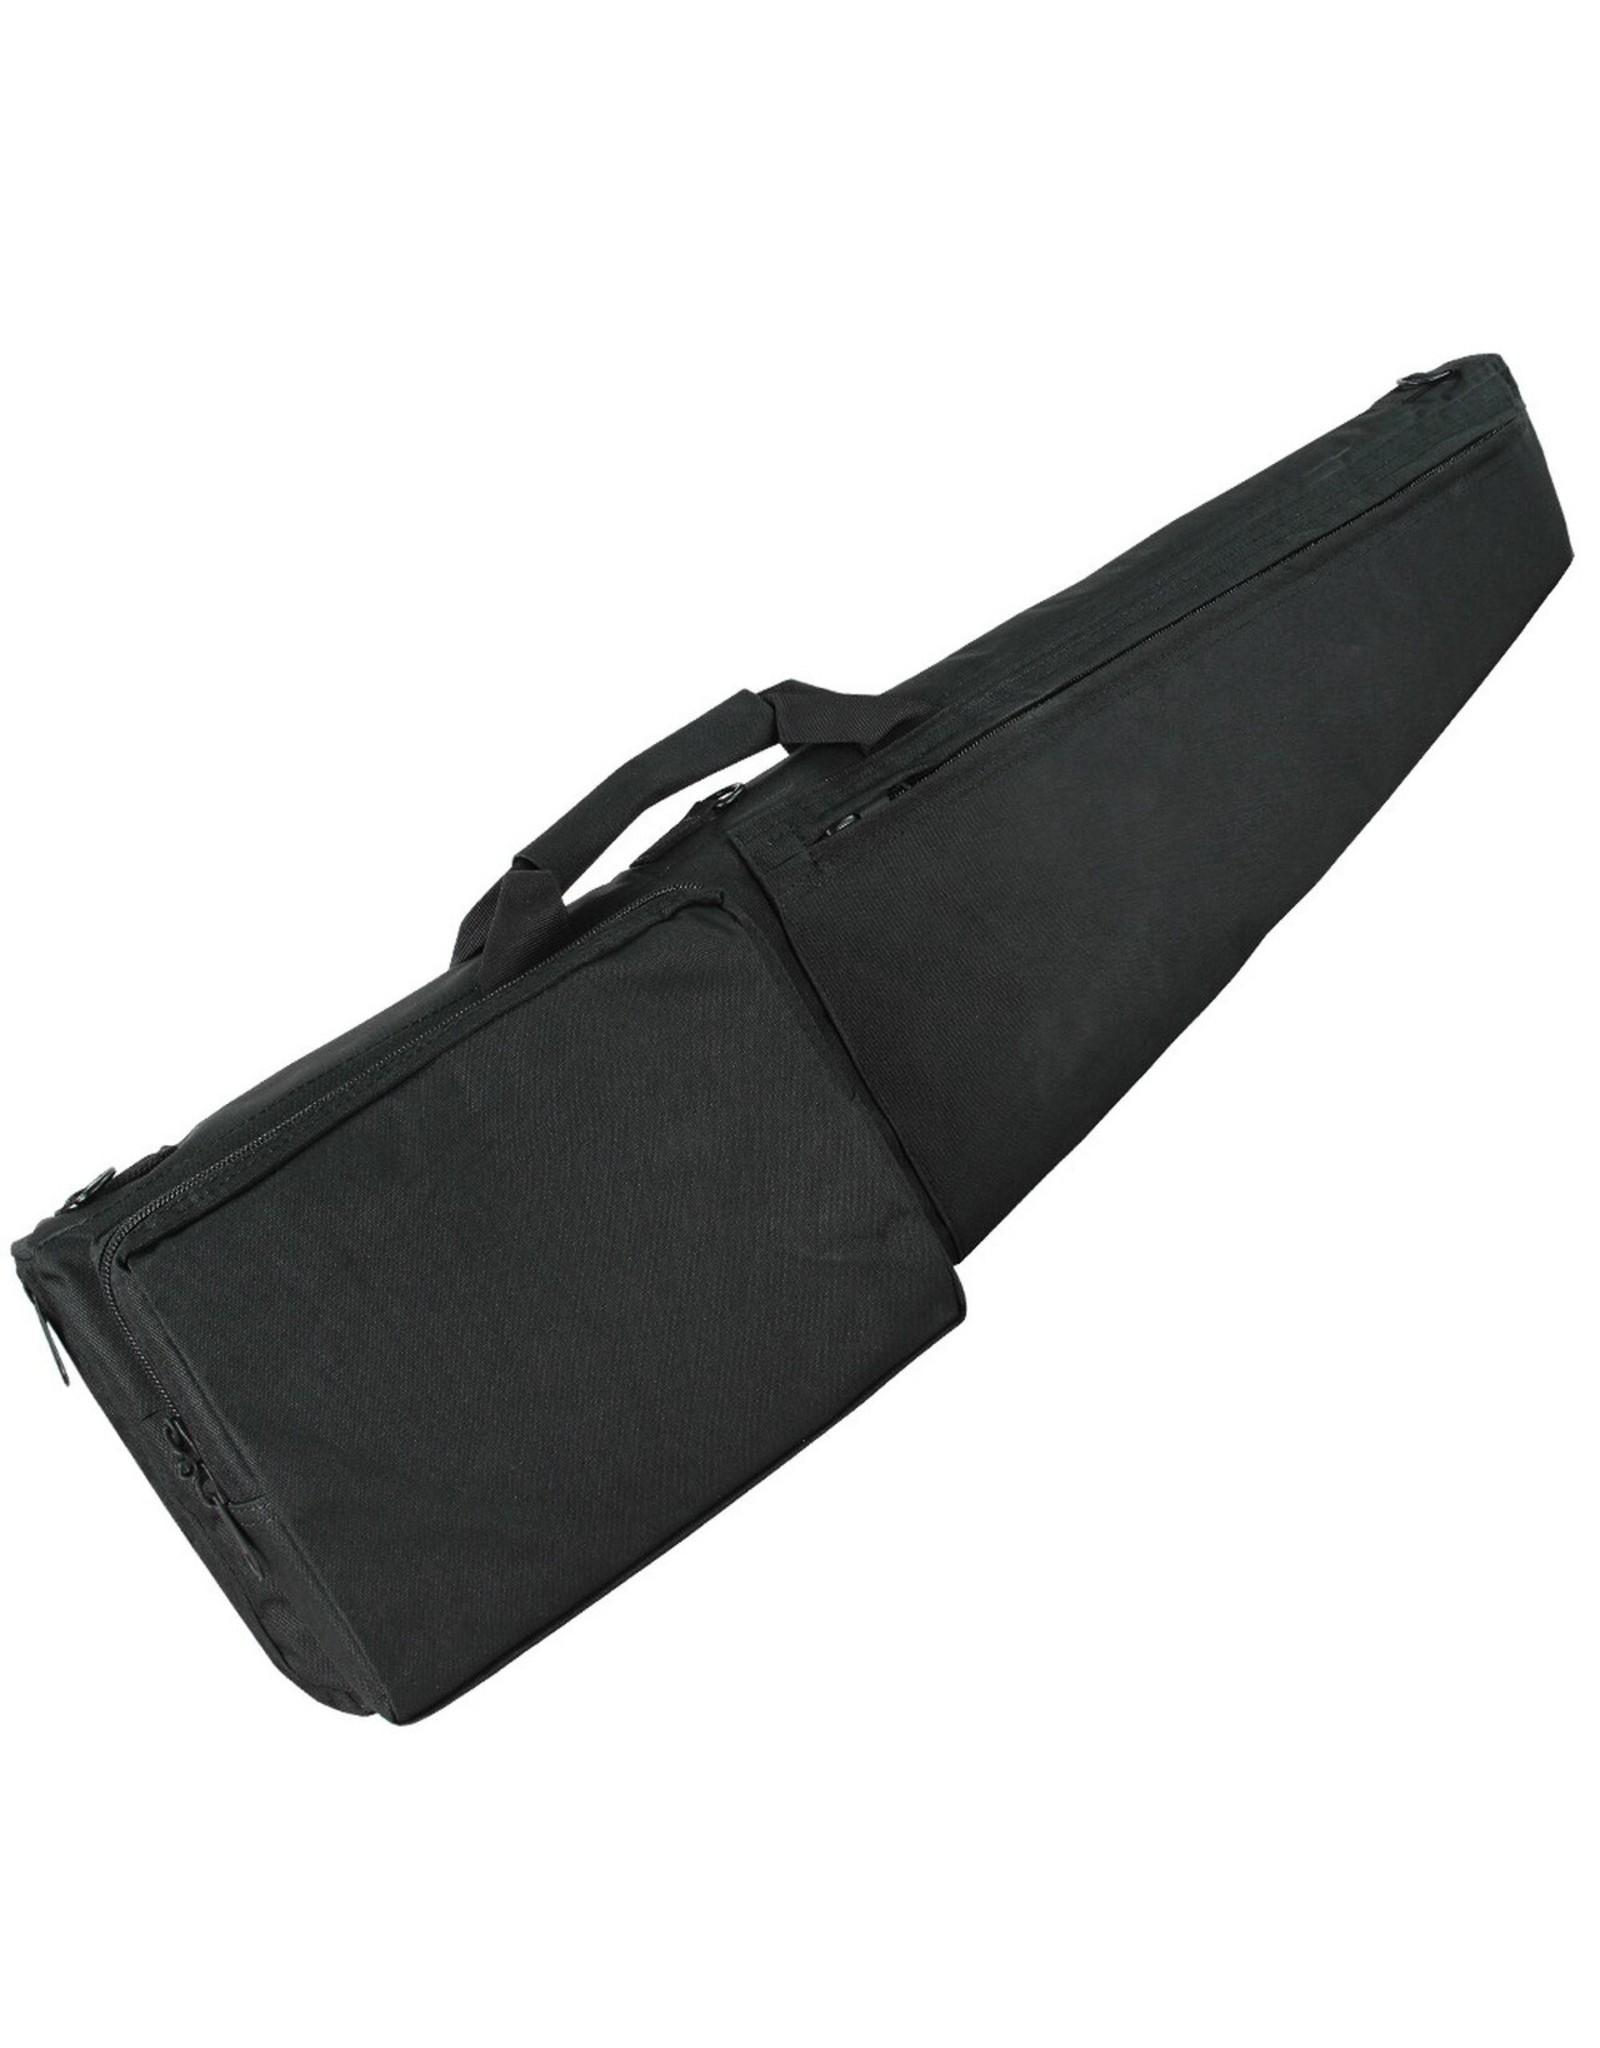 "CONDOR TACTICAL CONDOR 38"" BLACK RIFLE CASE"